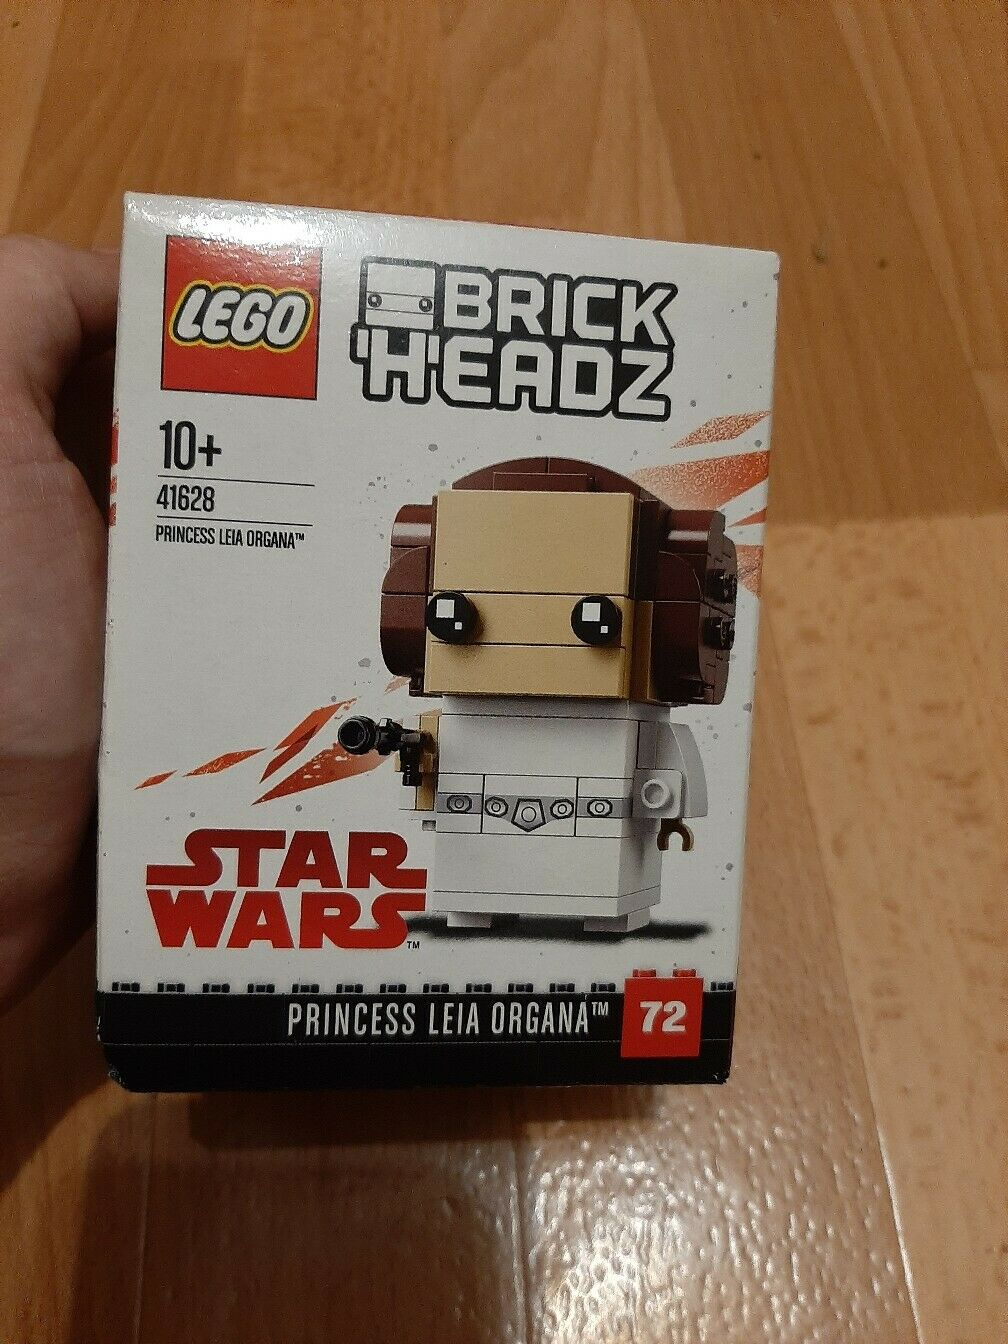 41628 Principessa Leia organa Brickheadz